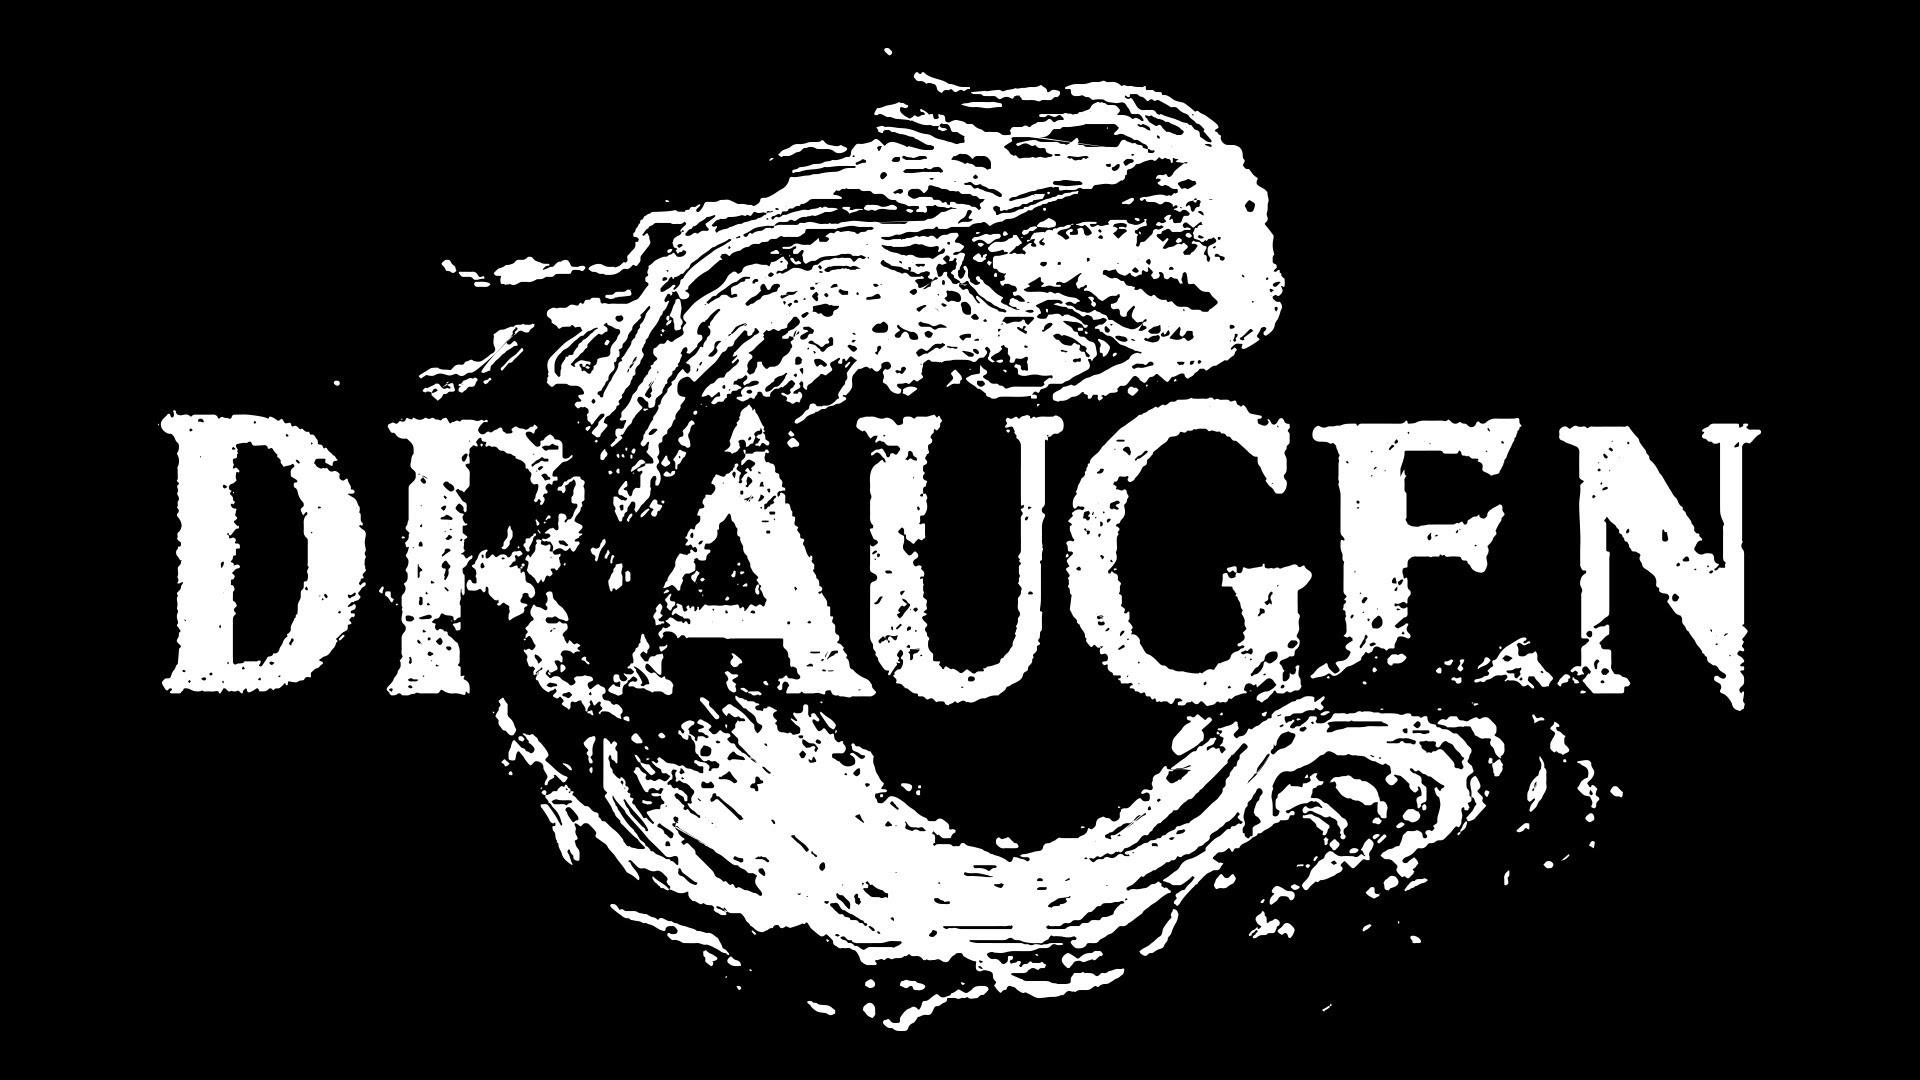 Draugen Slated For 2019 Release